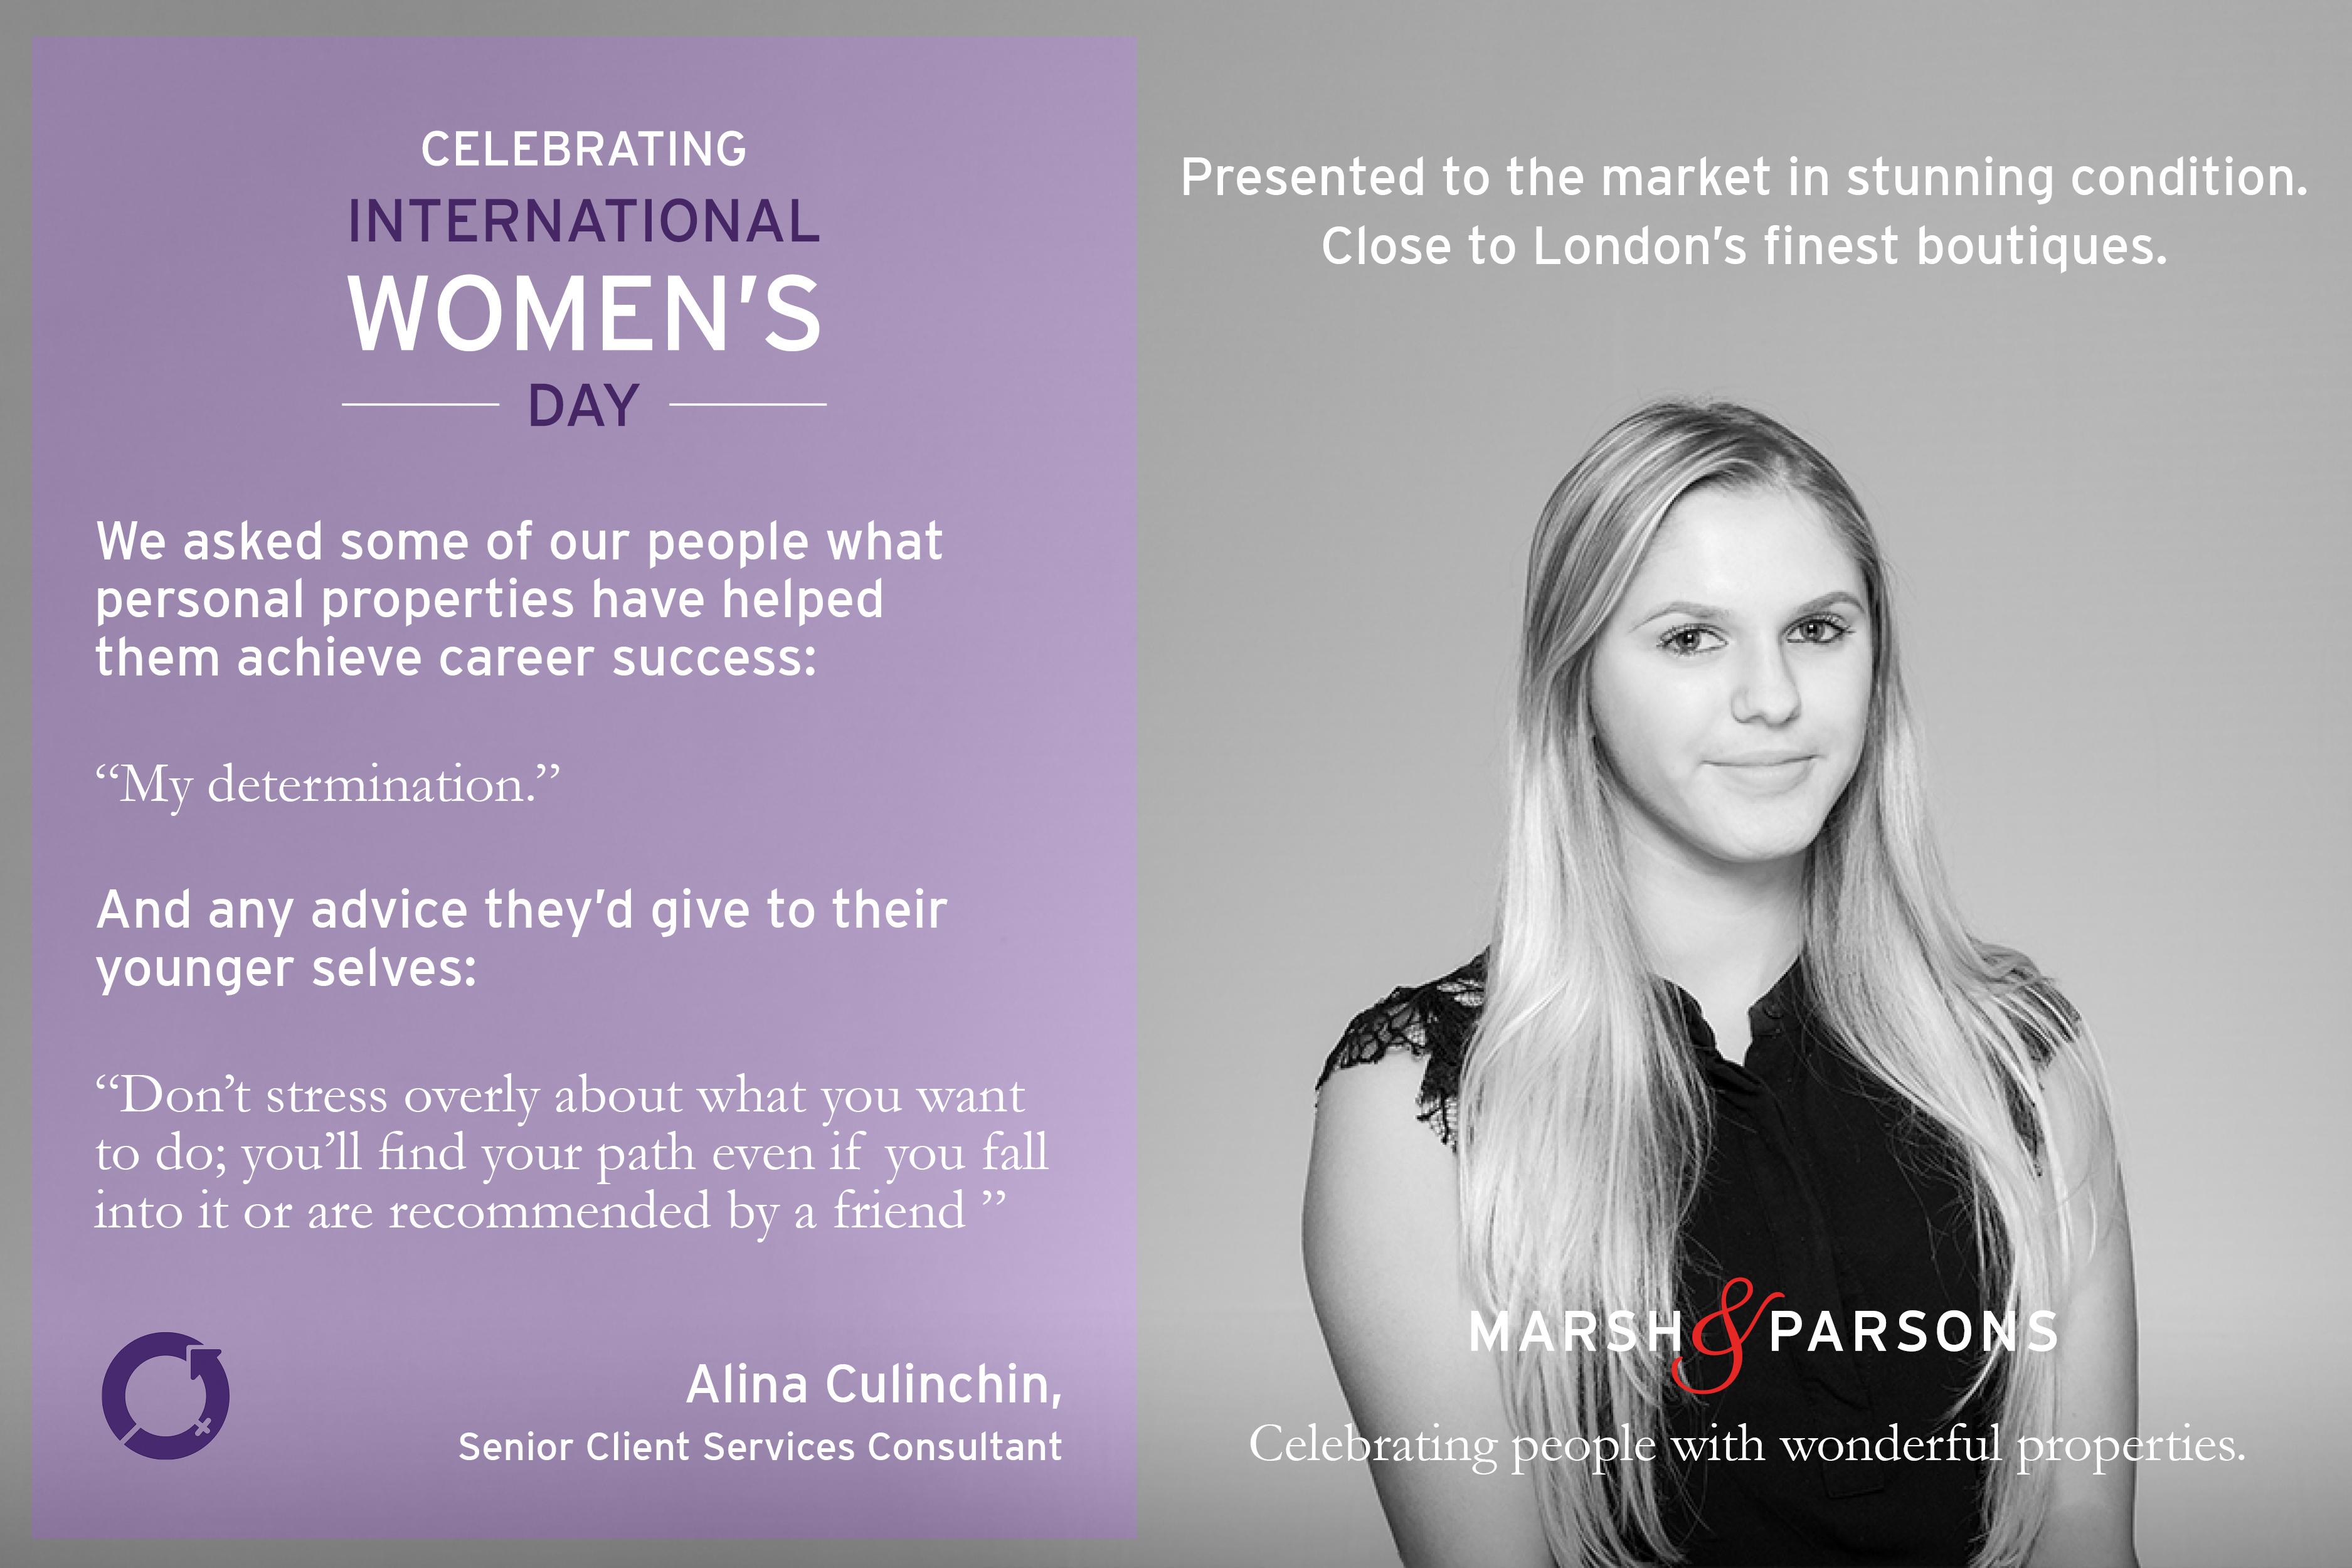 Alina, International Women's Day